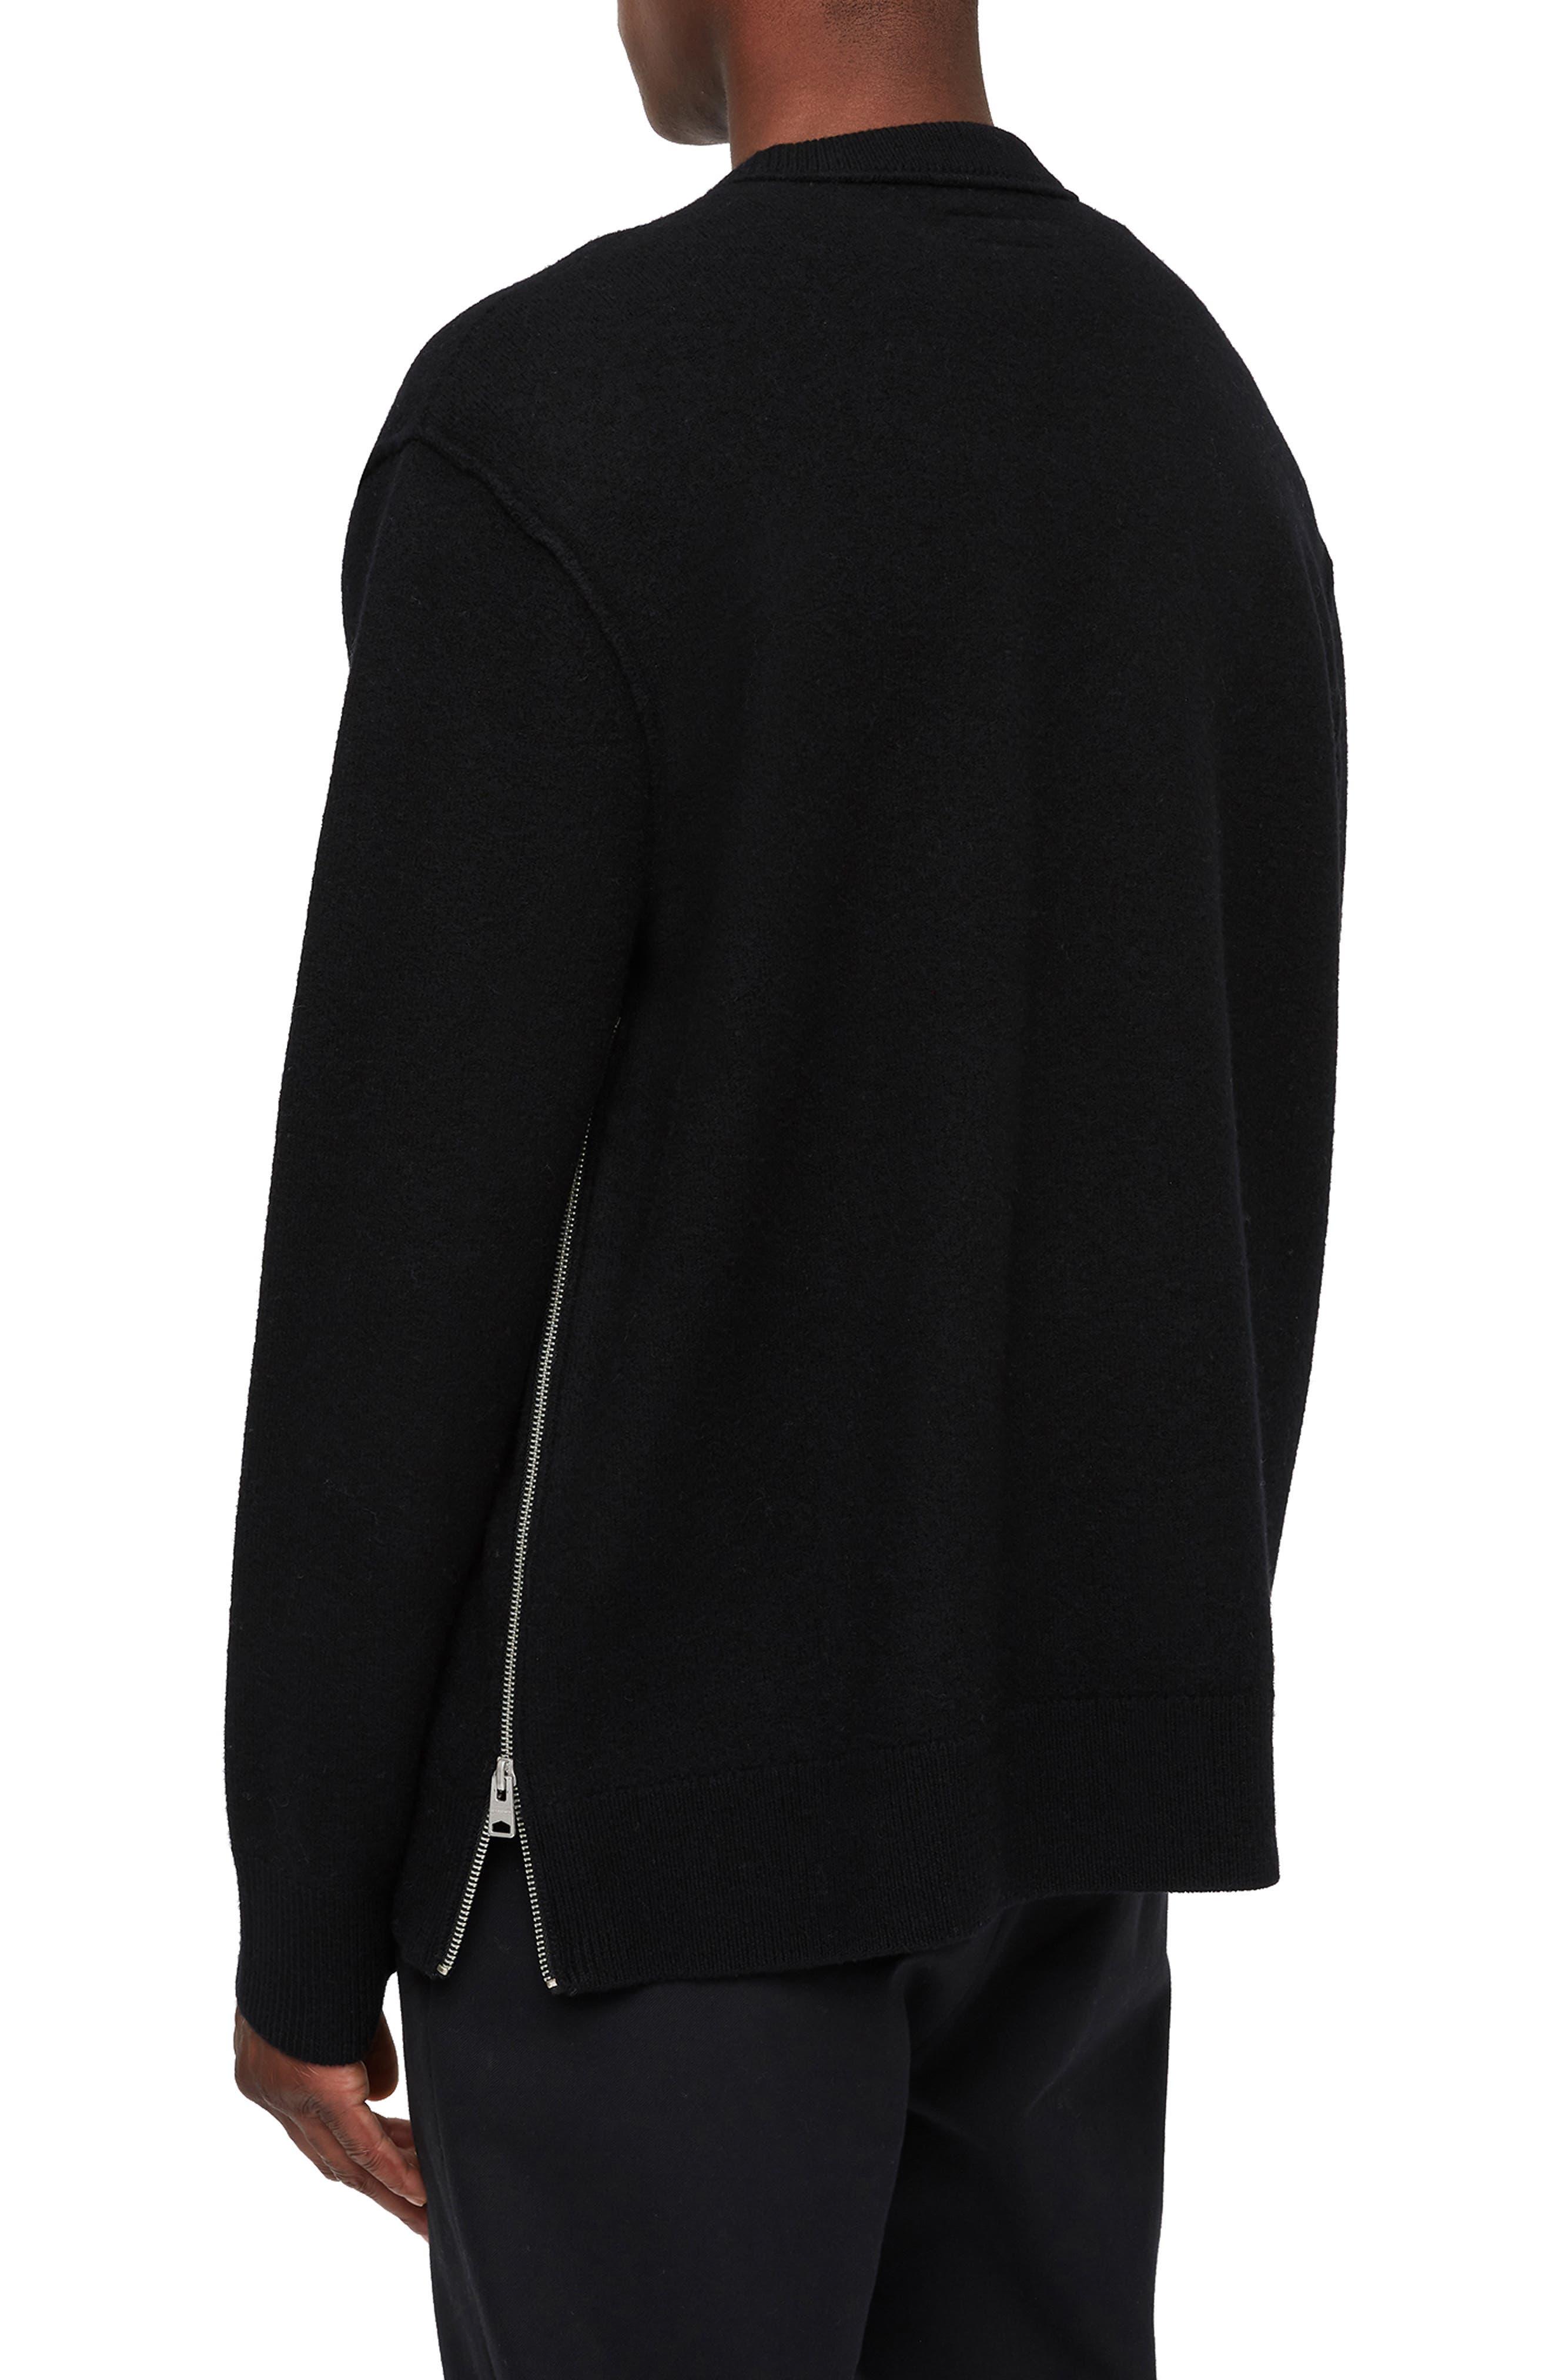 Maine Regular Fit Wool Sweater,                             Alternate thumbnail 2, color,                             BLACK